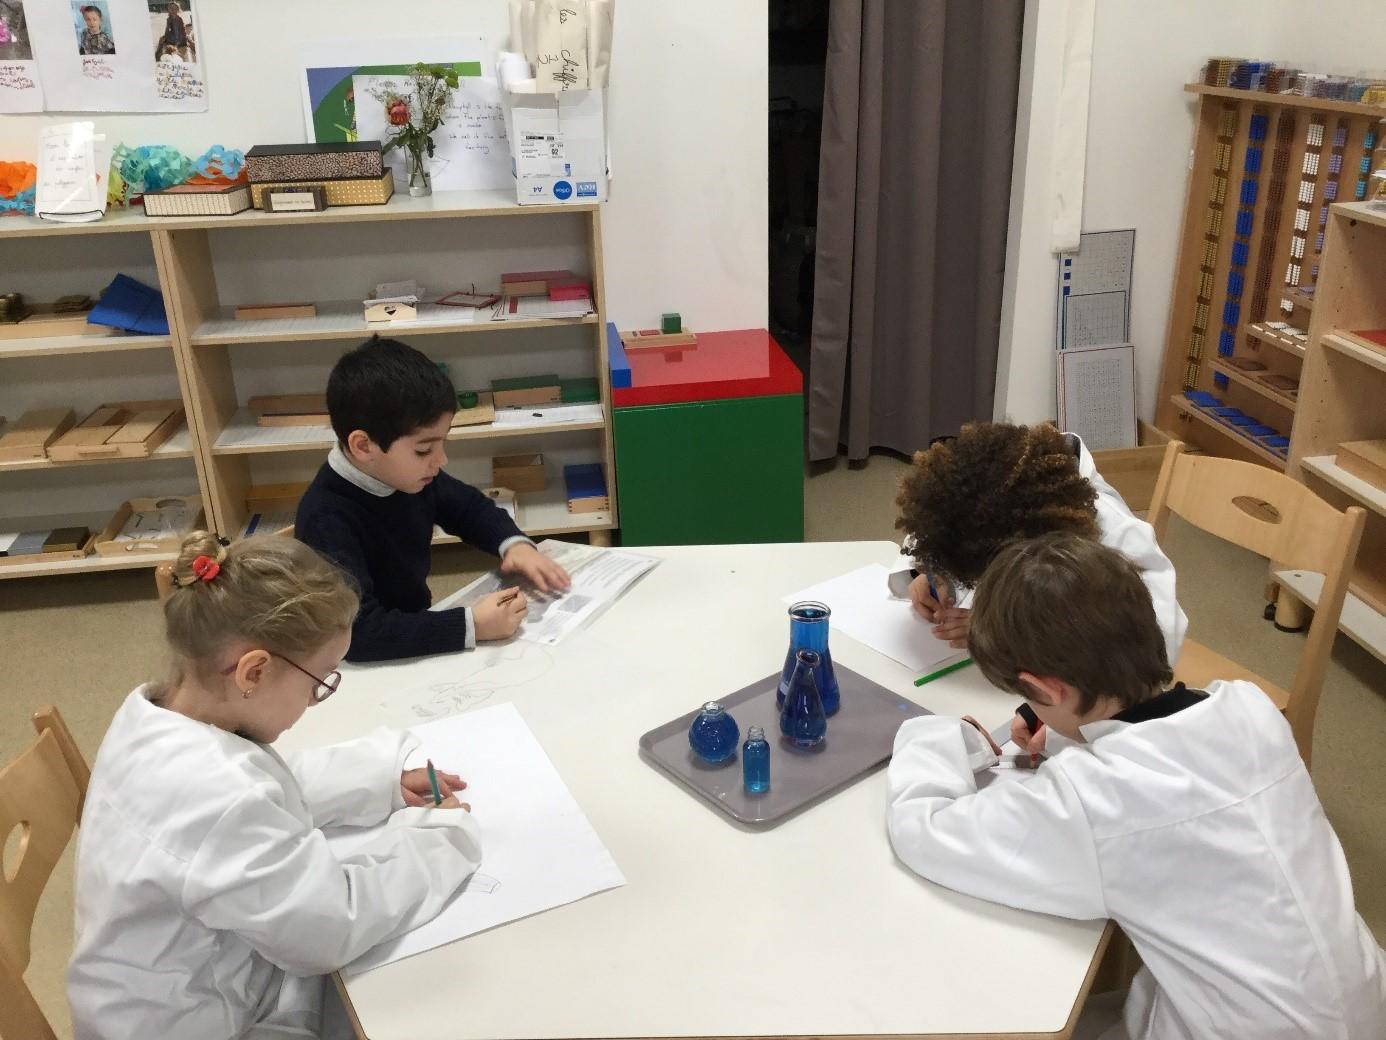 Sciences Montessori enfants 6-12 ans Ecole Montessori Beautiful Minds